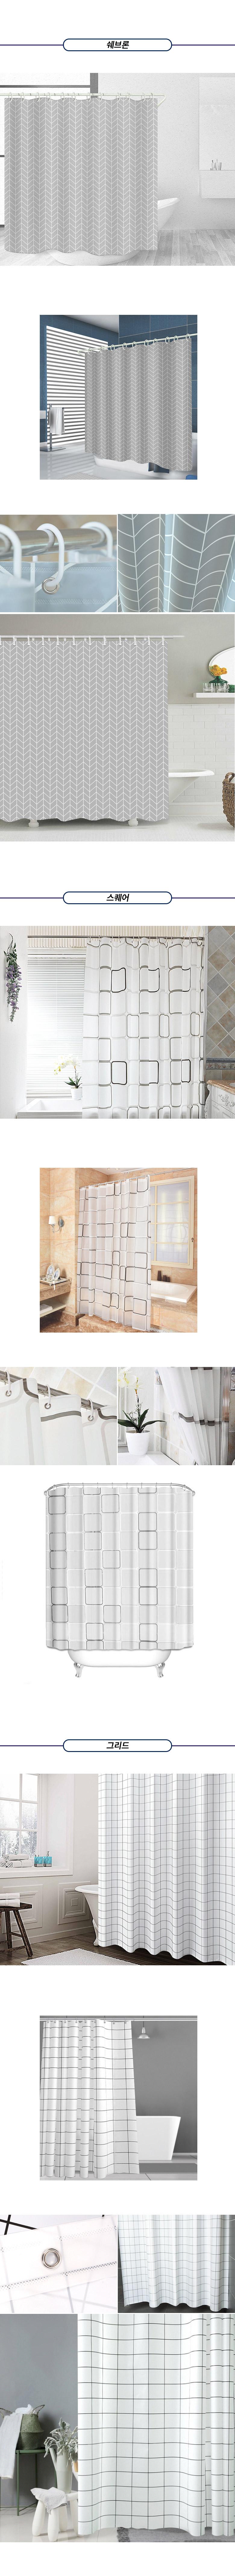 (A타입)욕실 샤워커튼 화장실커튼 - 홀트레이드, 5,900원, 세안/목욕, 샤워커튼